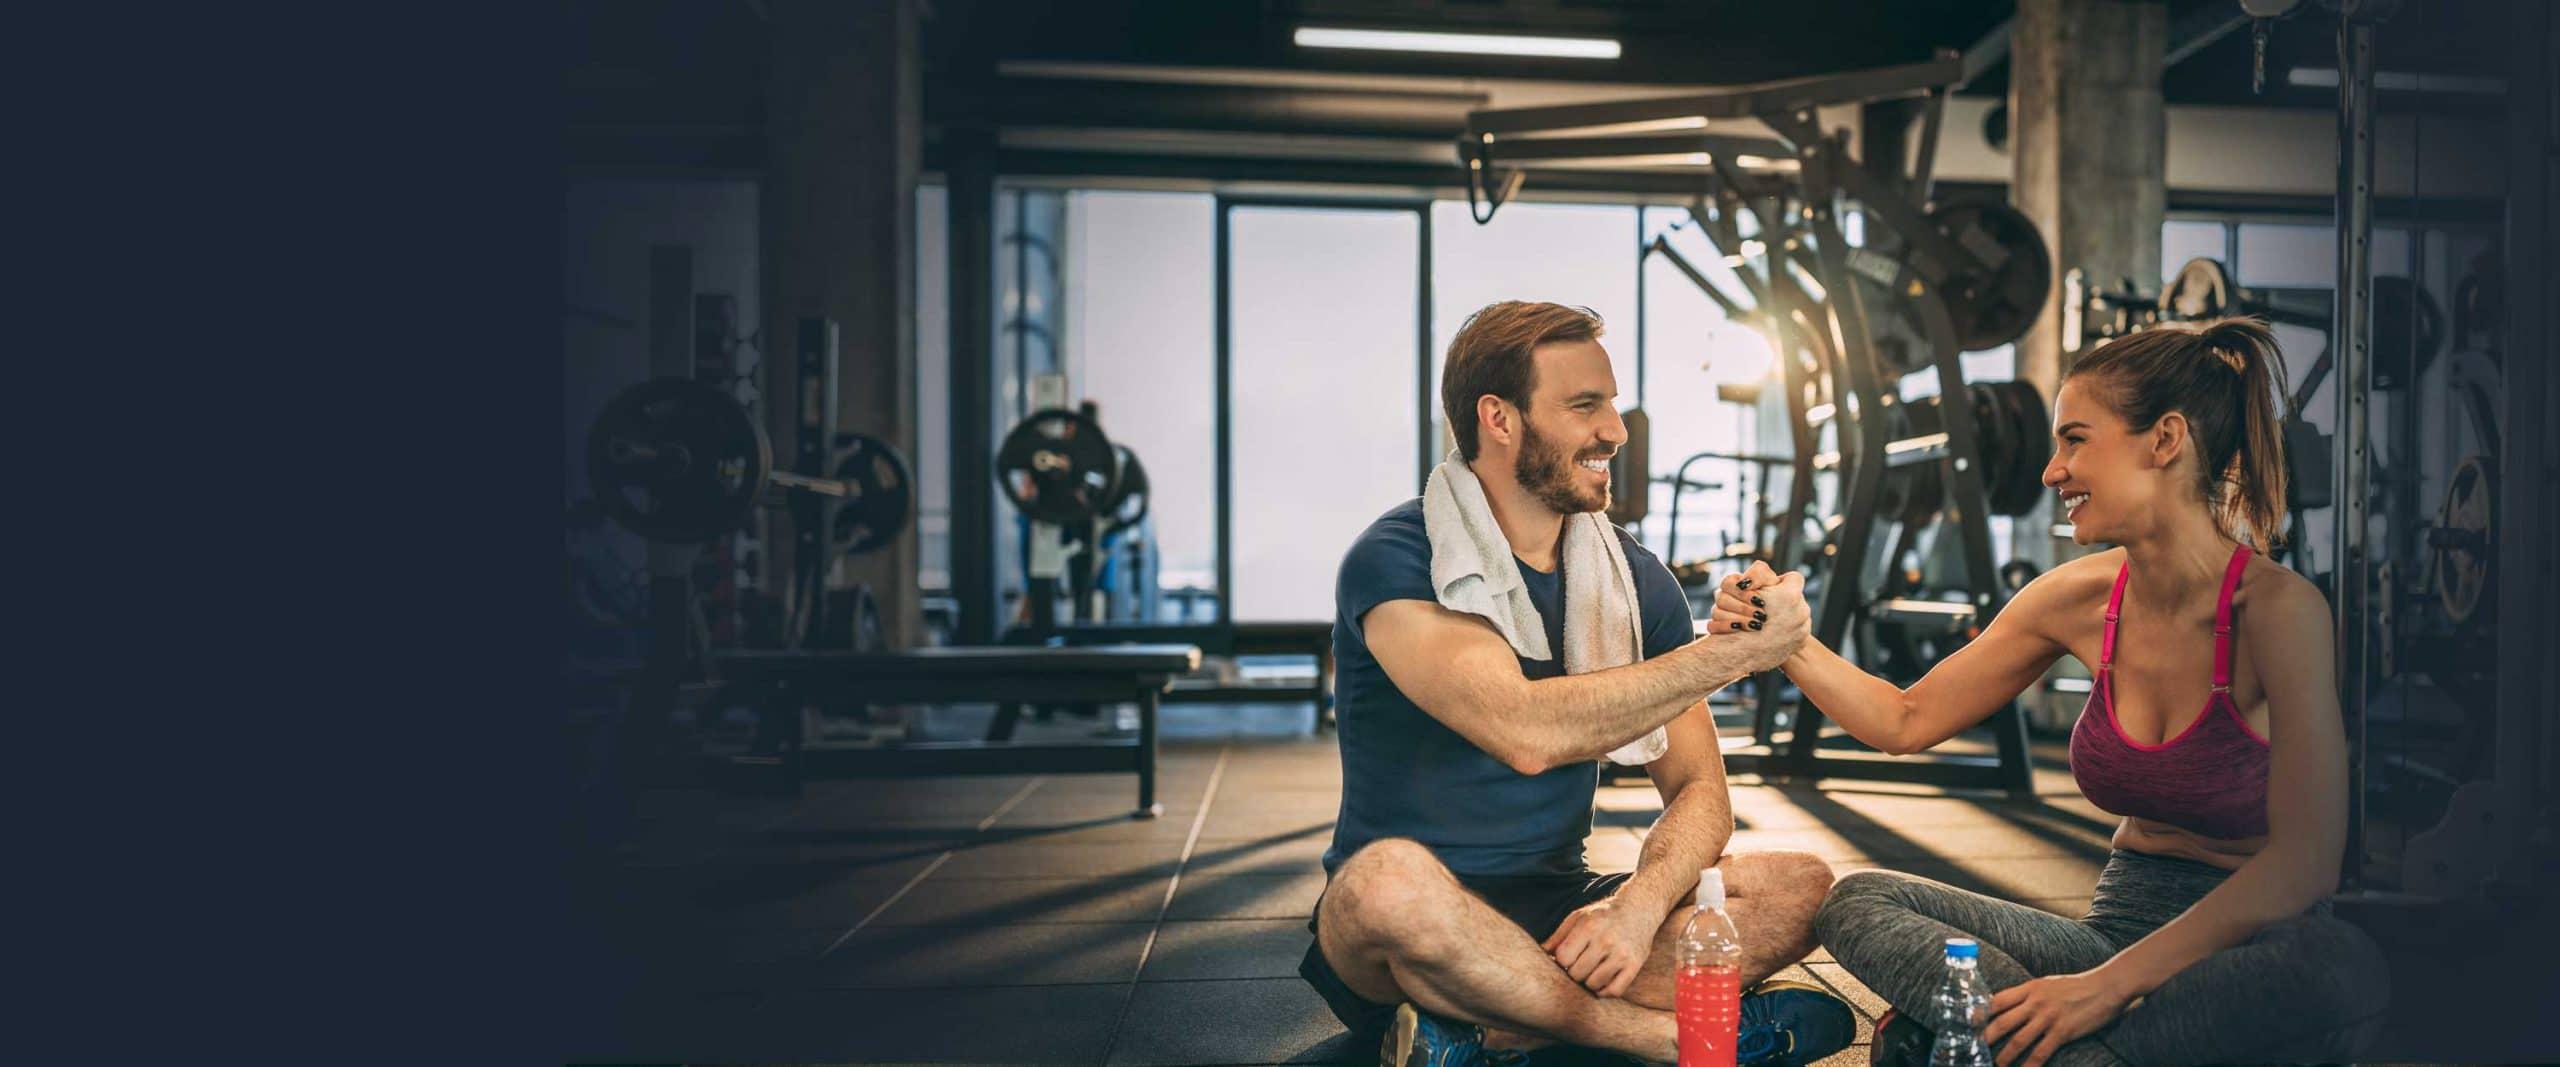 6 Monate gratis Trainieren Angebot Fitnesspark Limburg